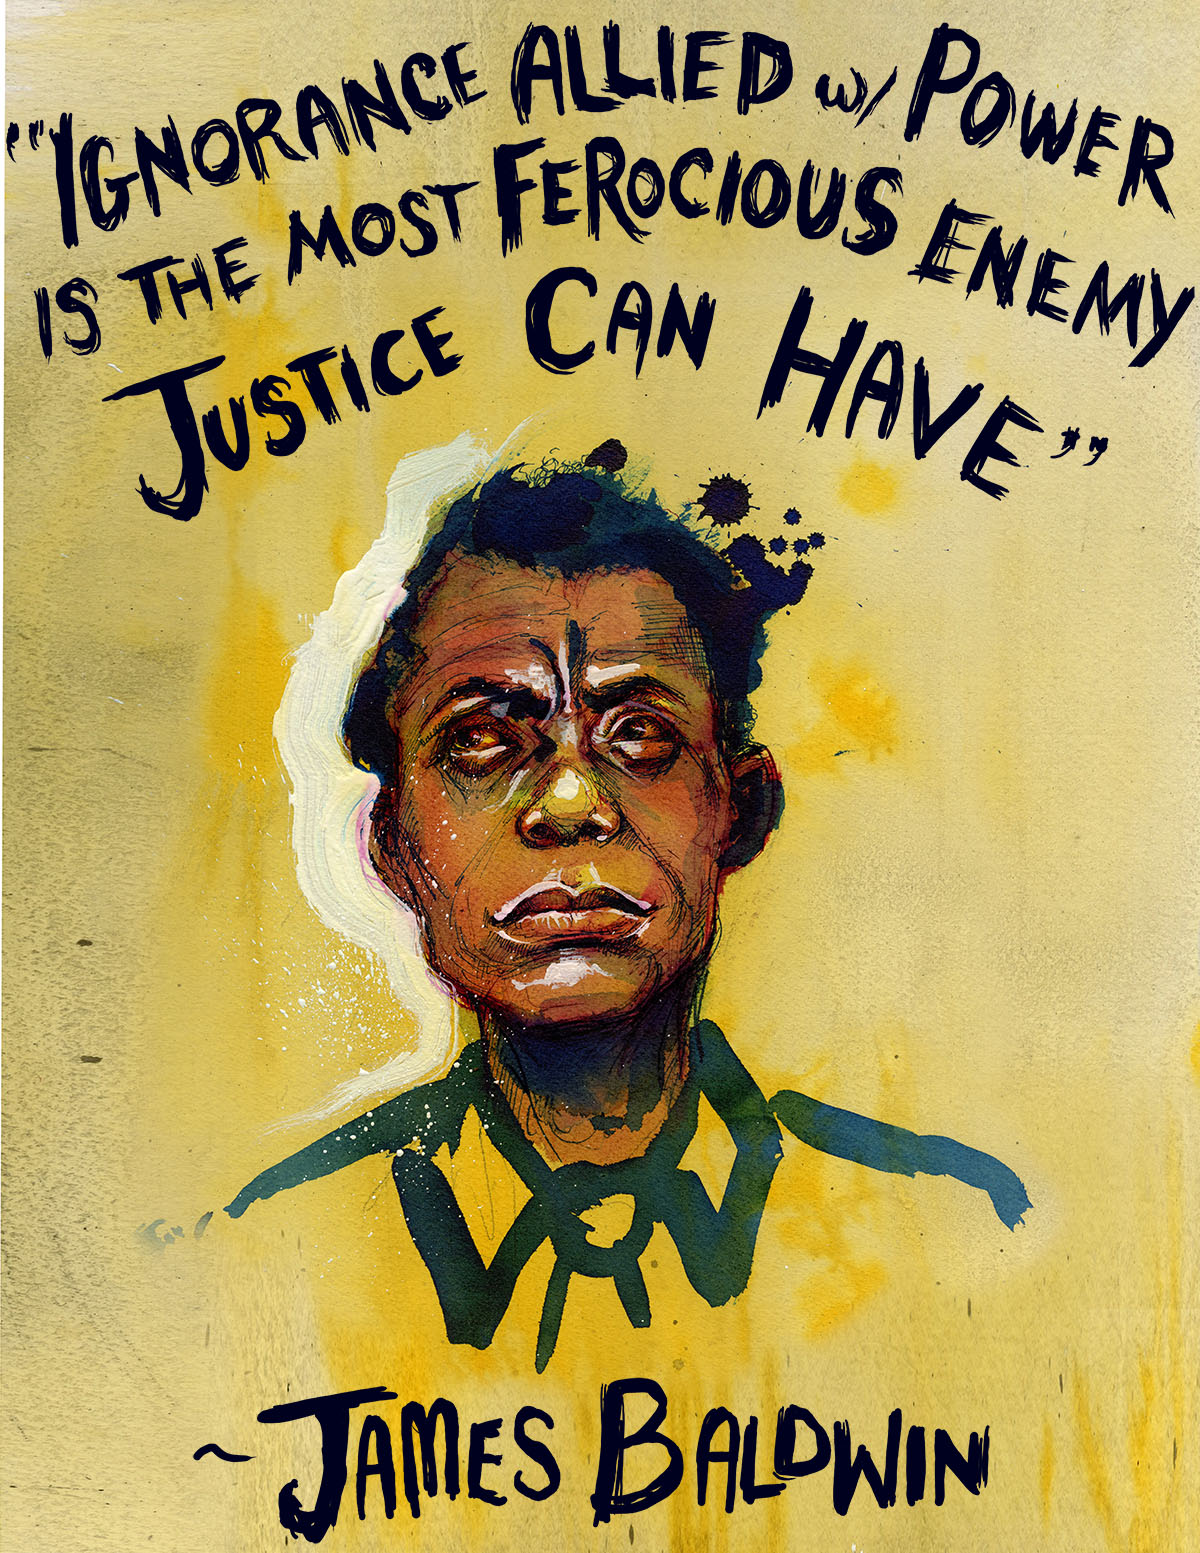 James Baldwin - The Art of Molly Crabapple